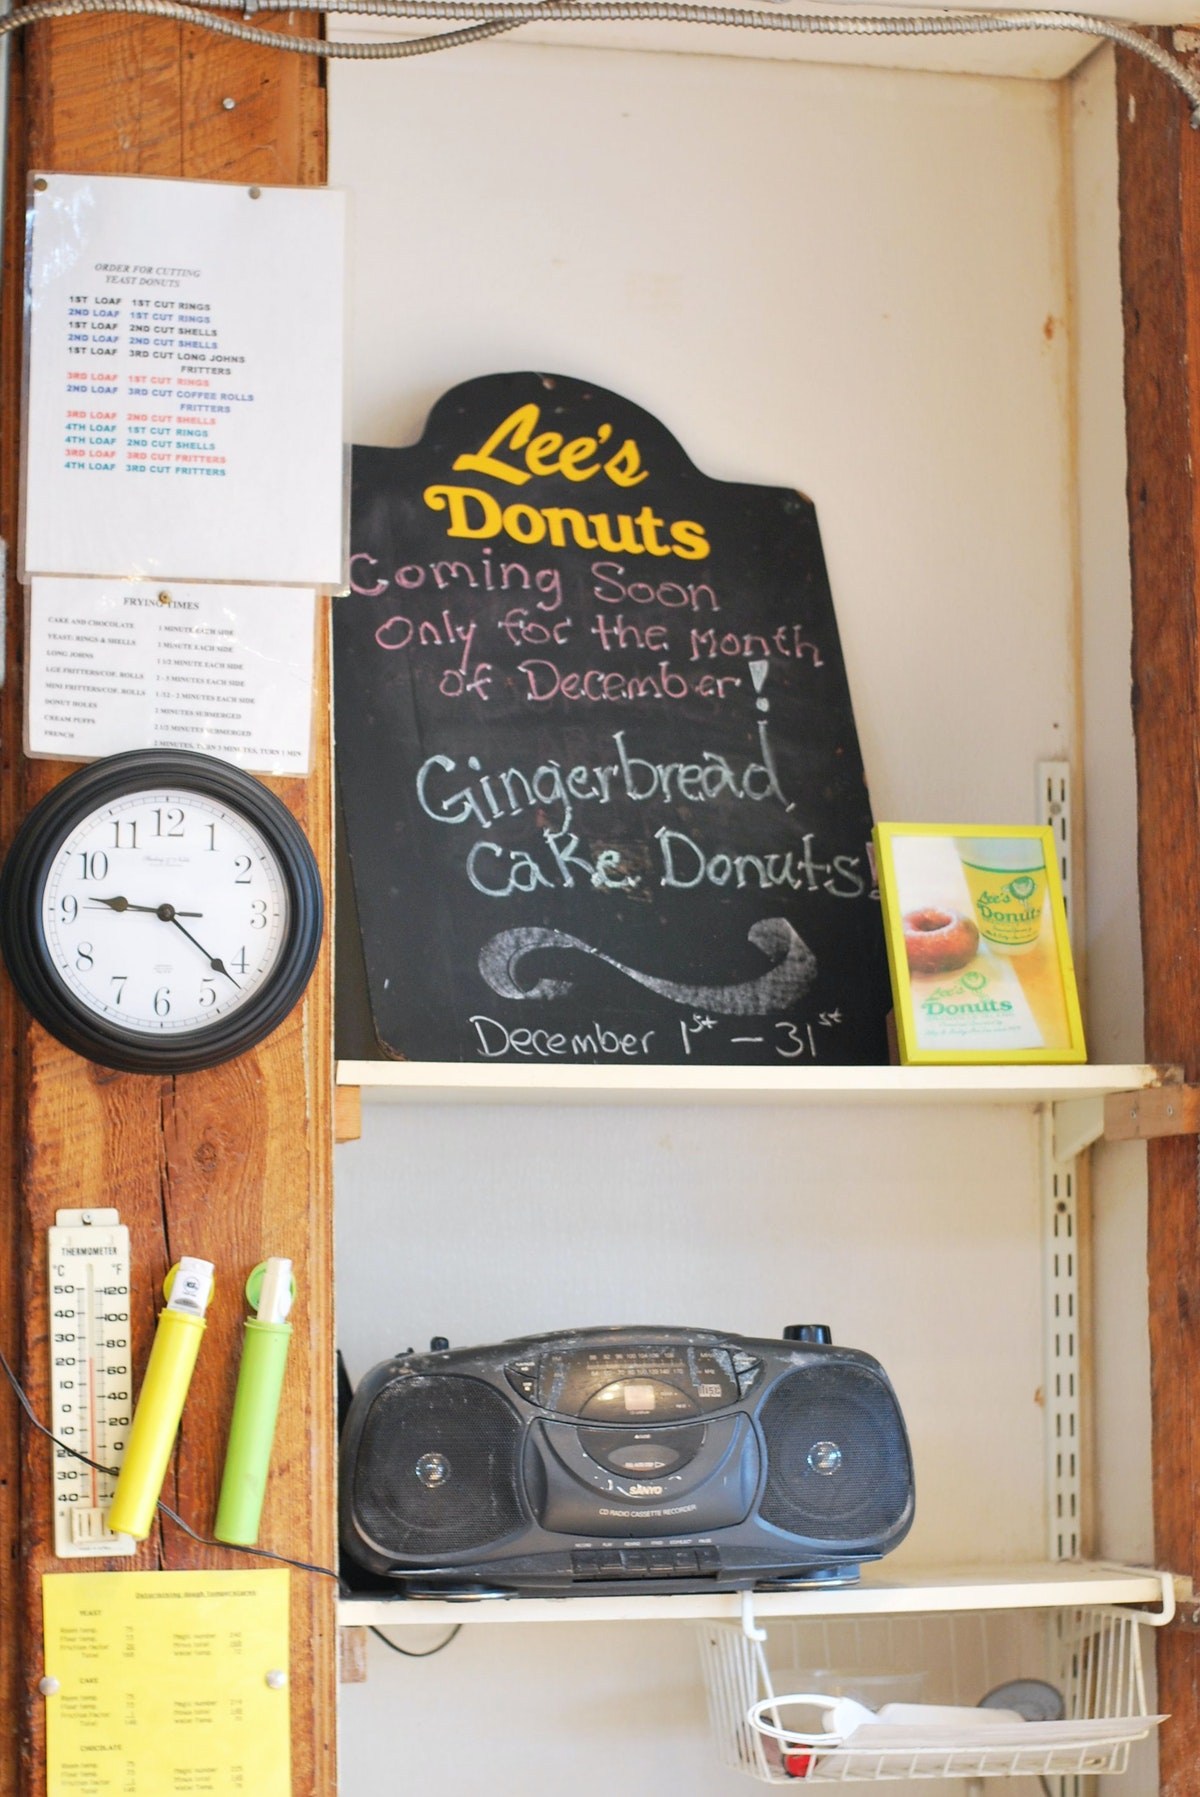 Lee's Doughnuts